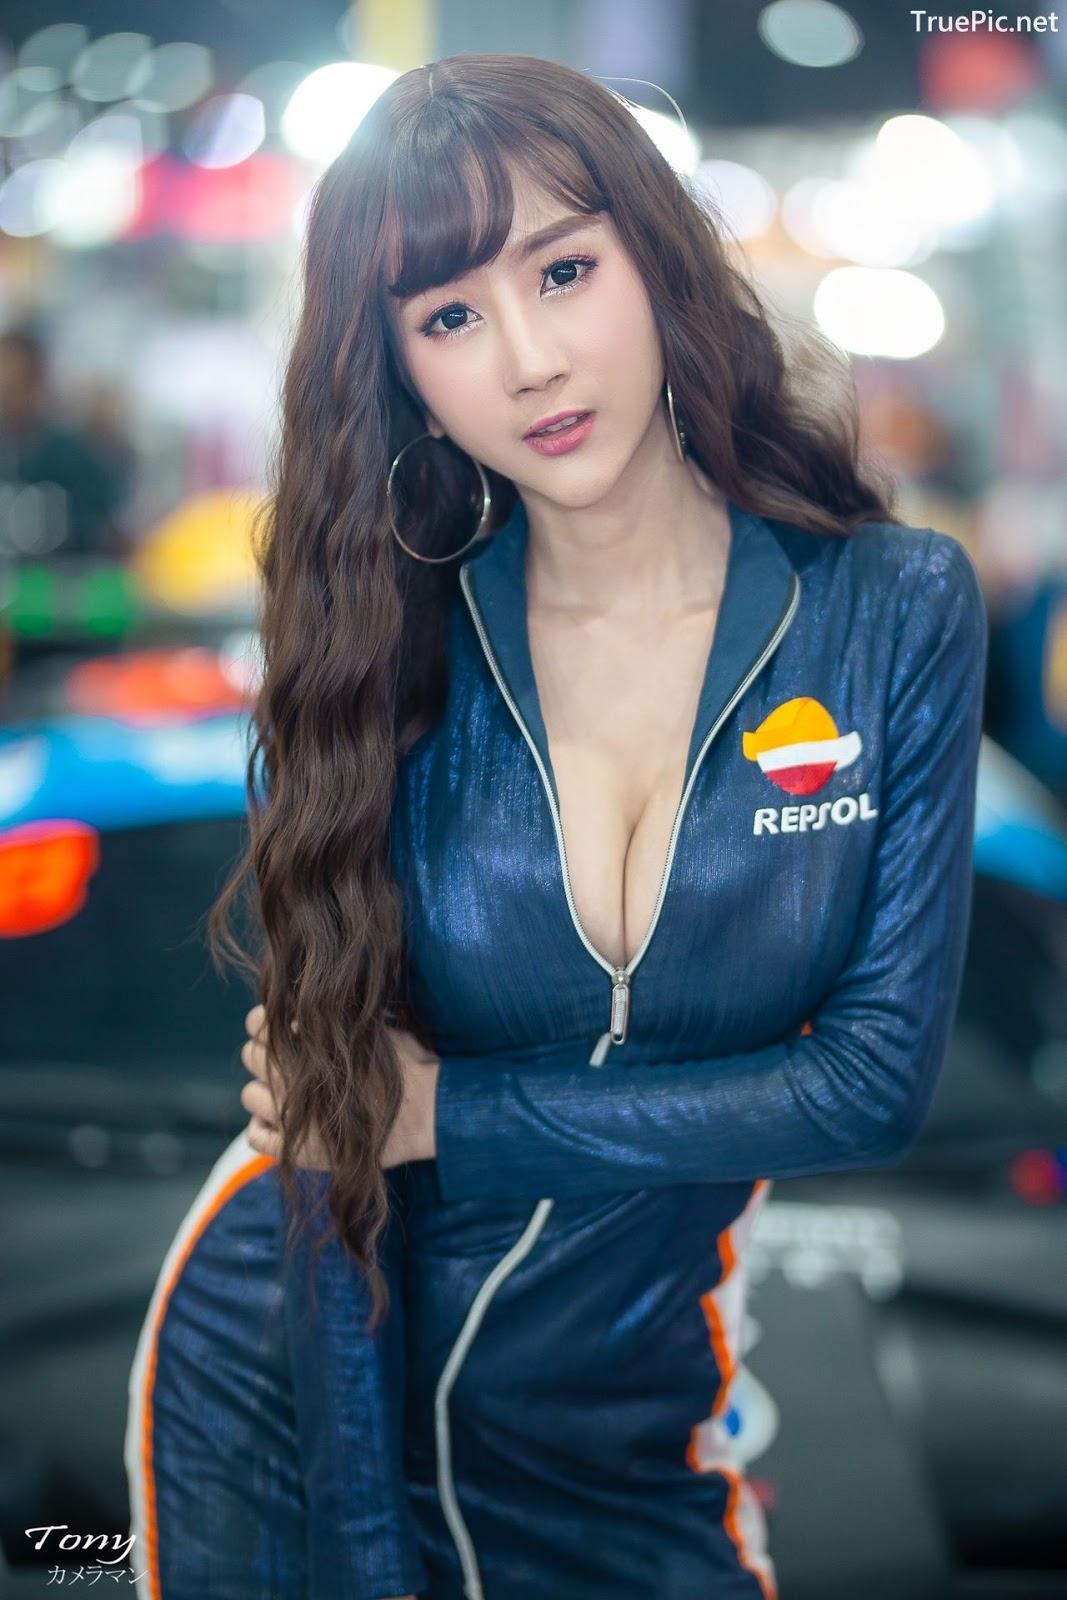 Image-Thailand-Hot-Model-Thai-Racing-Girl-At-Bangkok-Auto-Salon-2019-TruePic.net- Picture-8